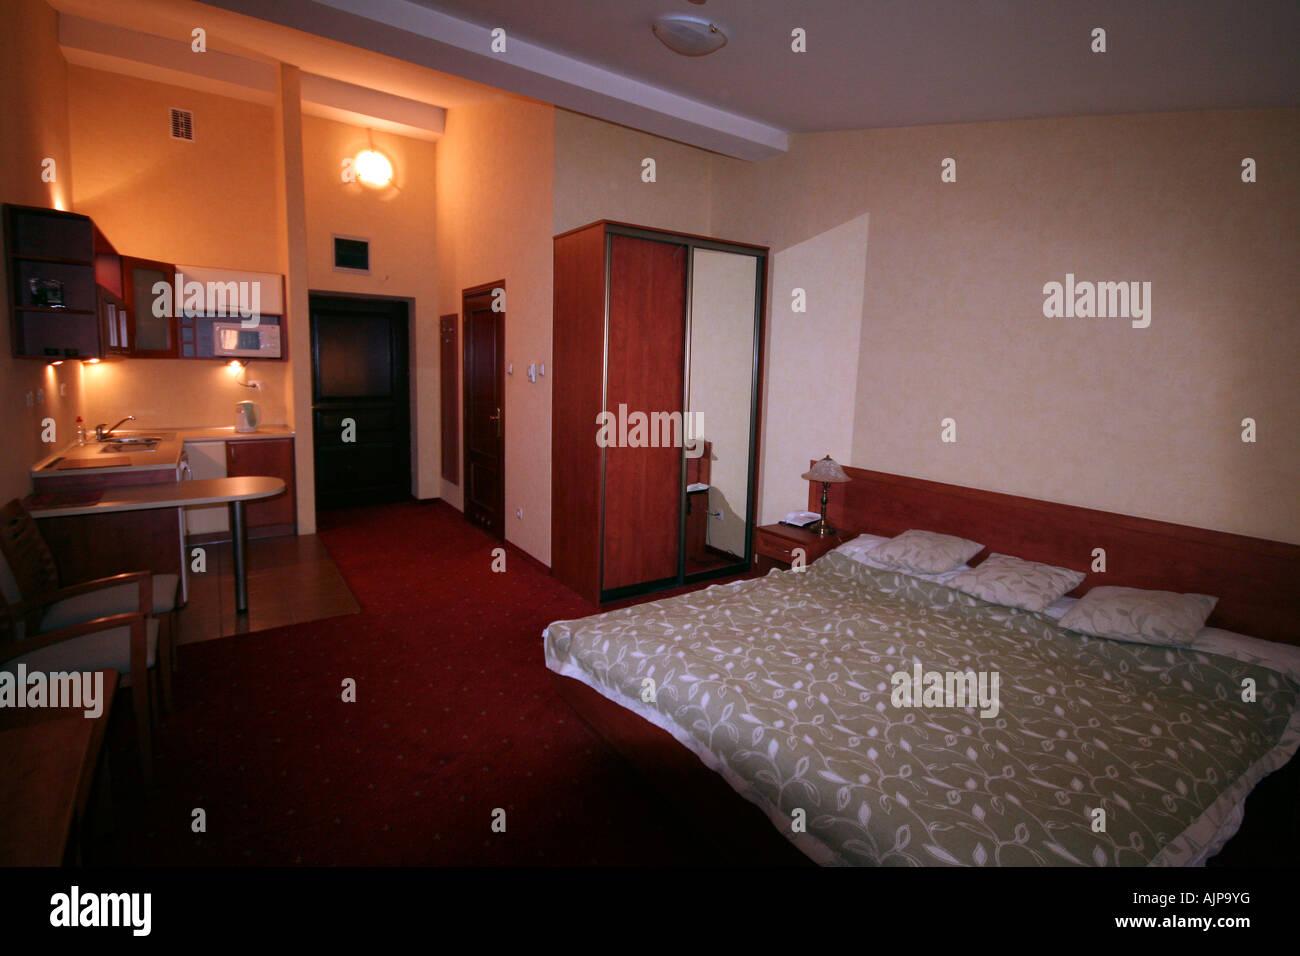 Hotel Zimmer Krakau Polen Europa Stockfoto Bild 14786451 Alamy